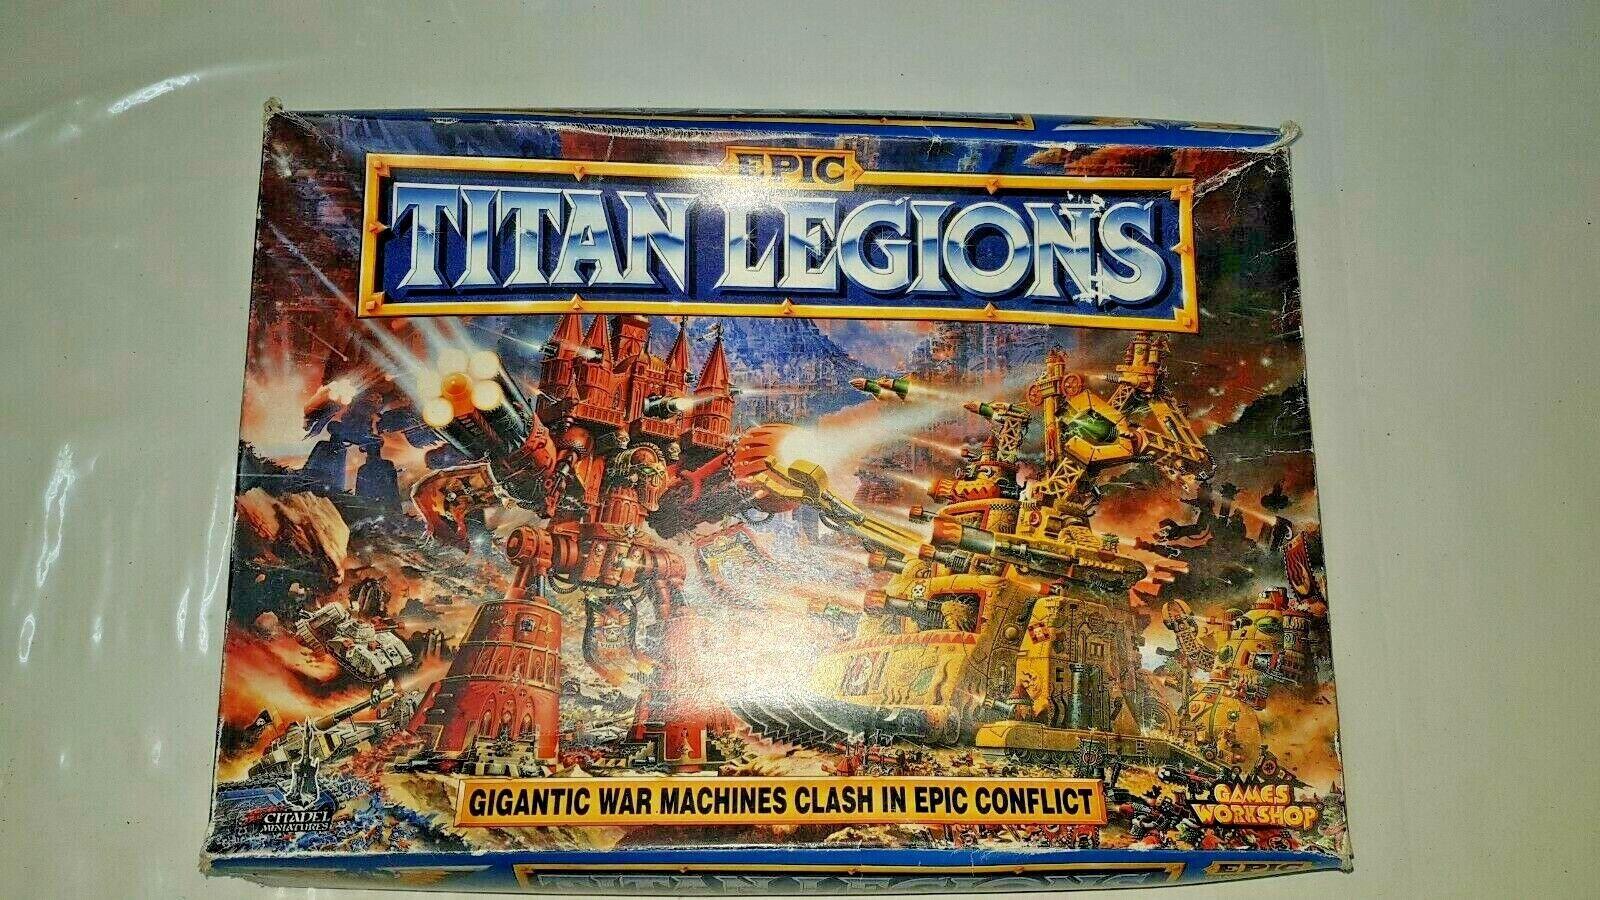 Warhammer giocos lavoronegozio Titan Legion fascio.gioco a tavola